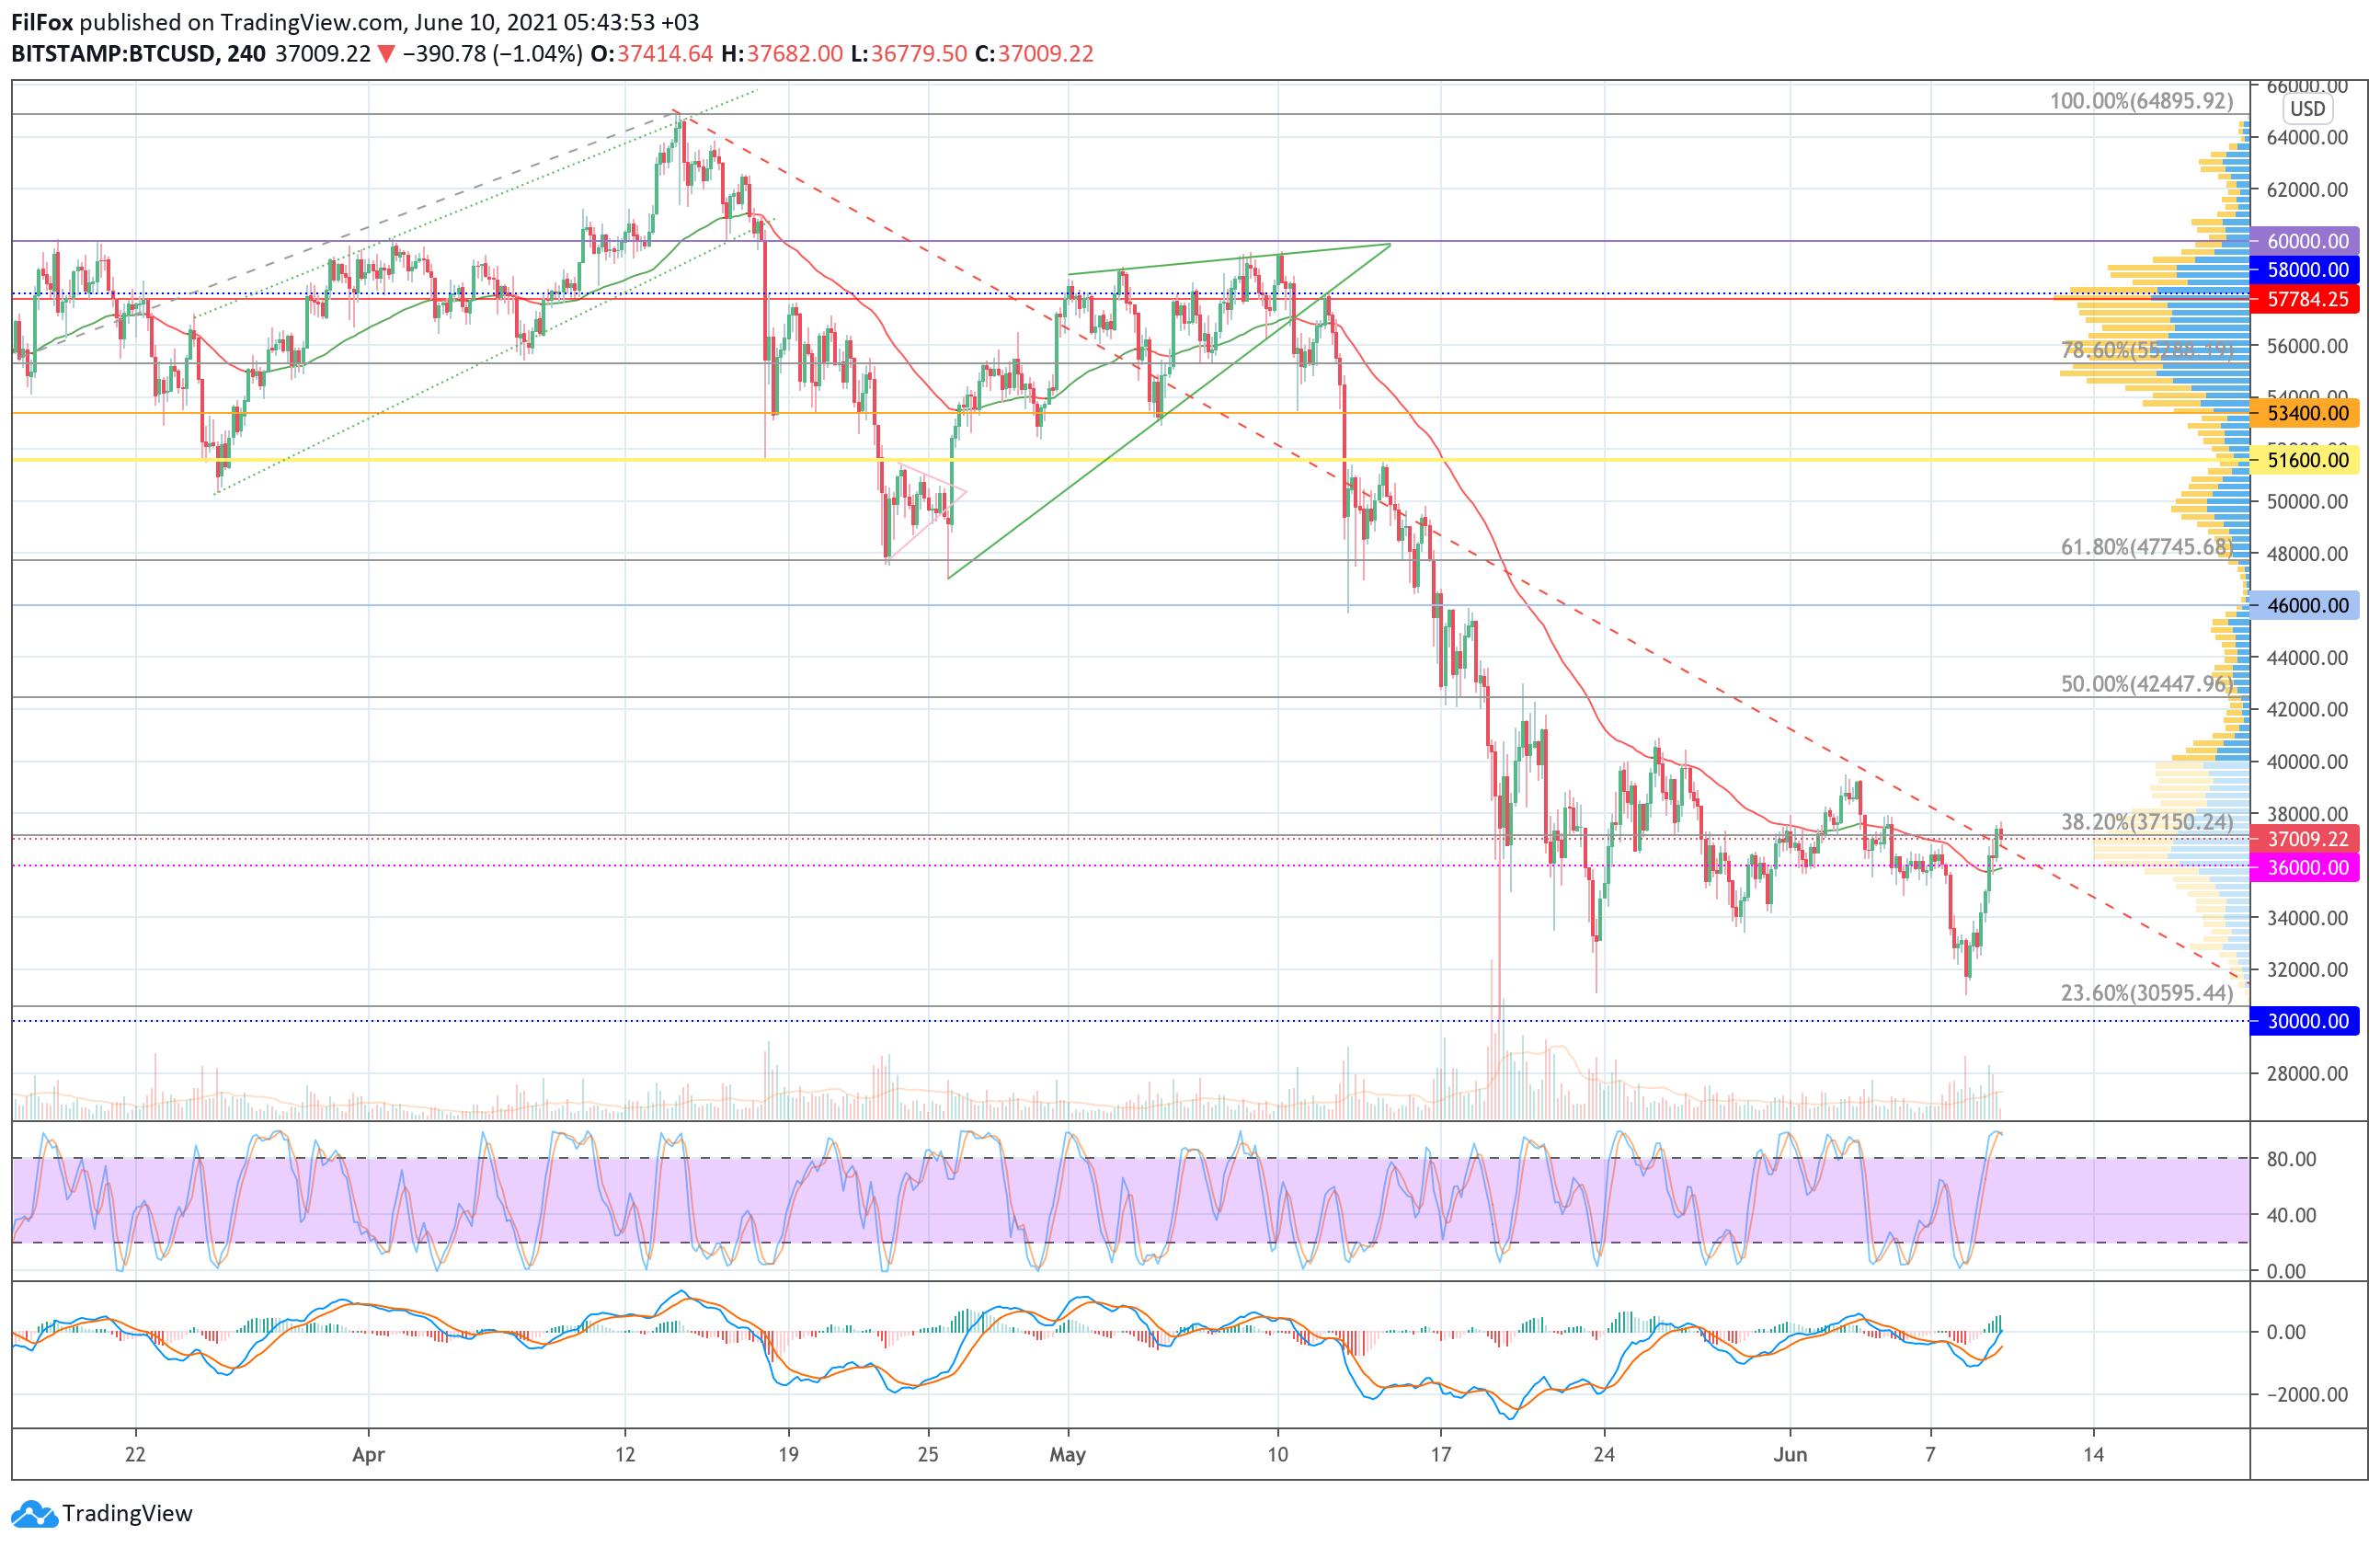 Анализ цен Bitcoin, Ethereum, XRP на 10.06.2021